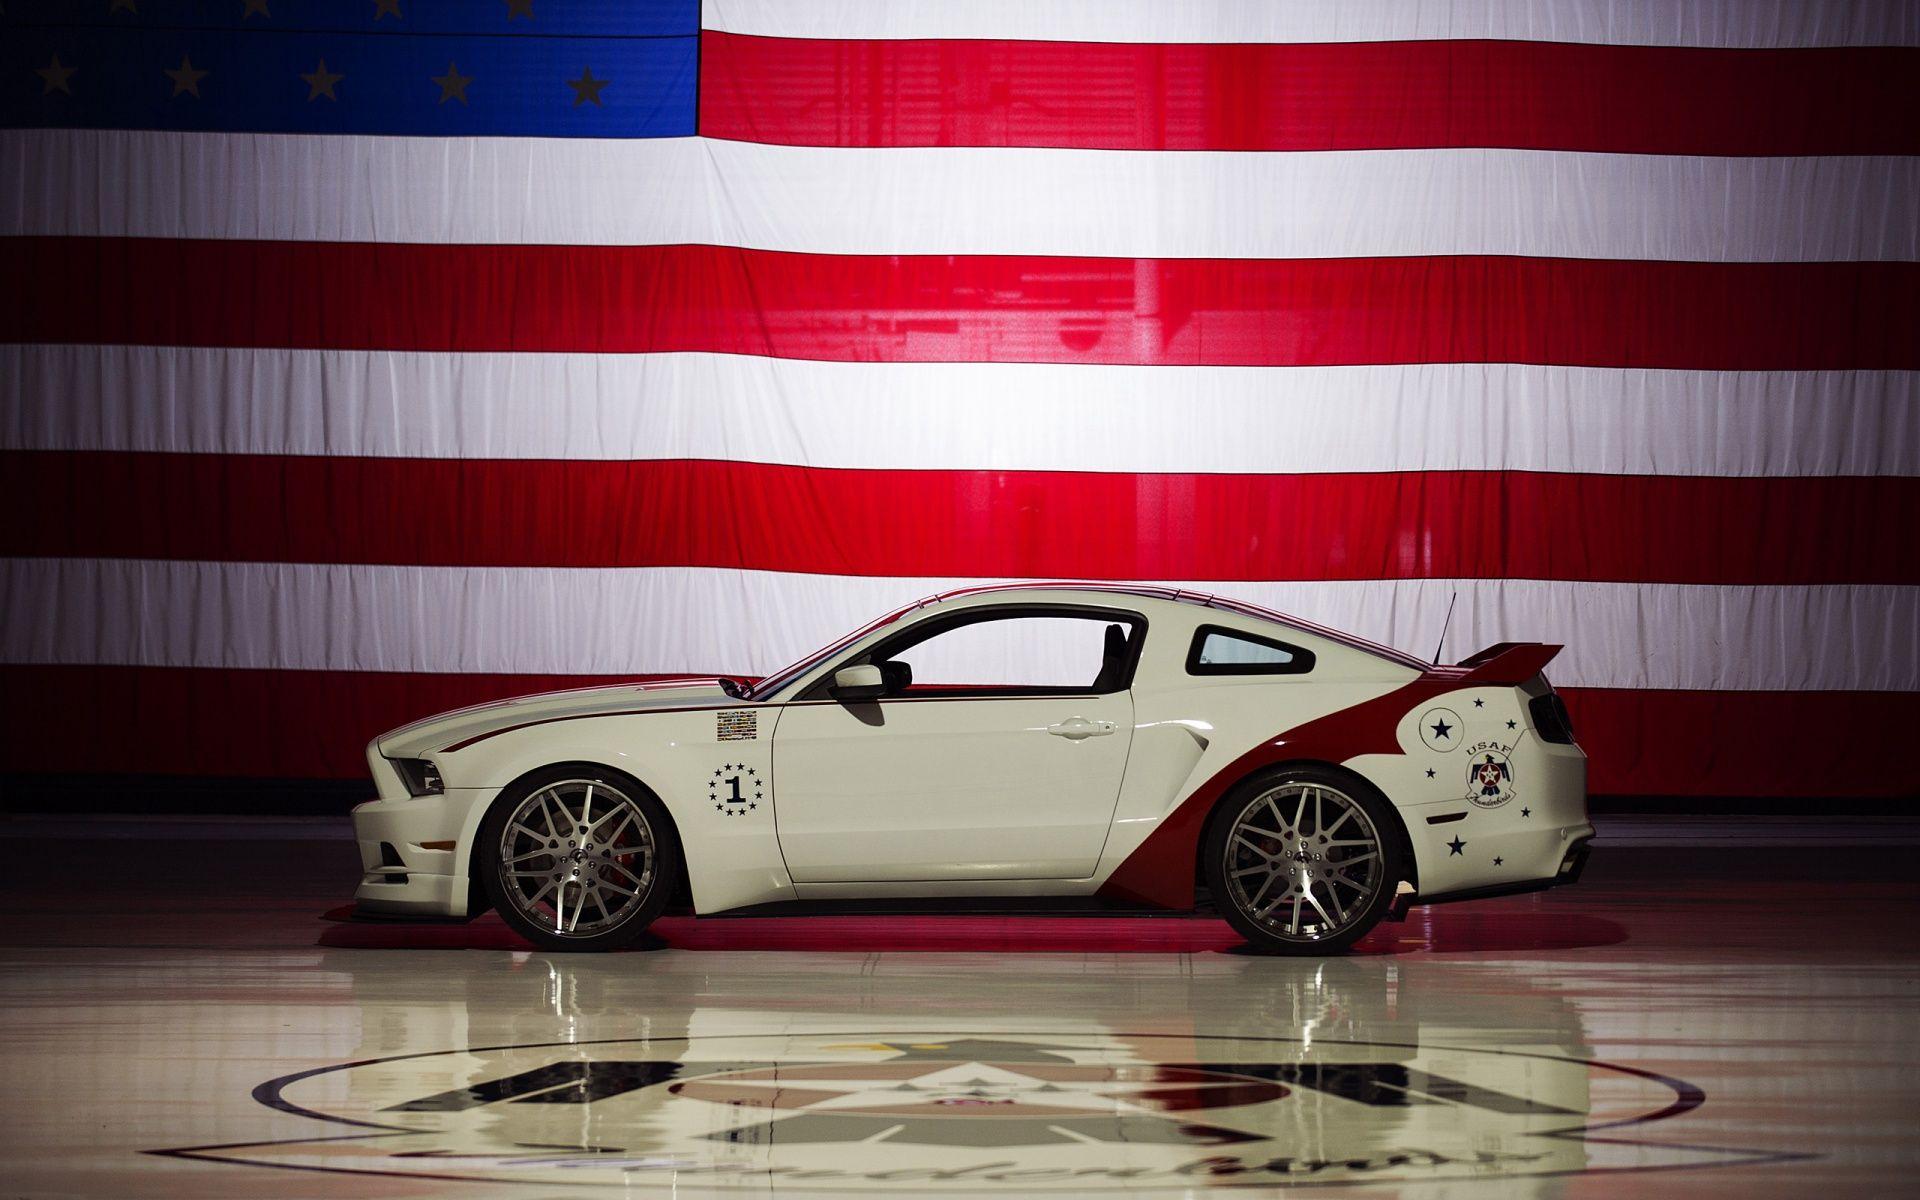 2014 Edition Ford Mustang Gt Wallpaper Cas Wallpaper Hd Ford